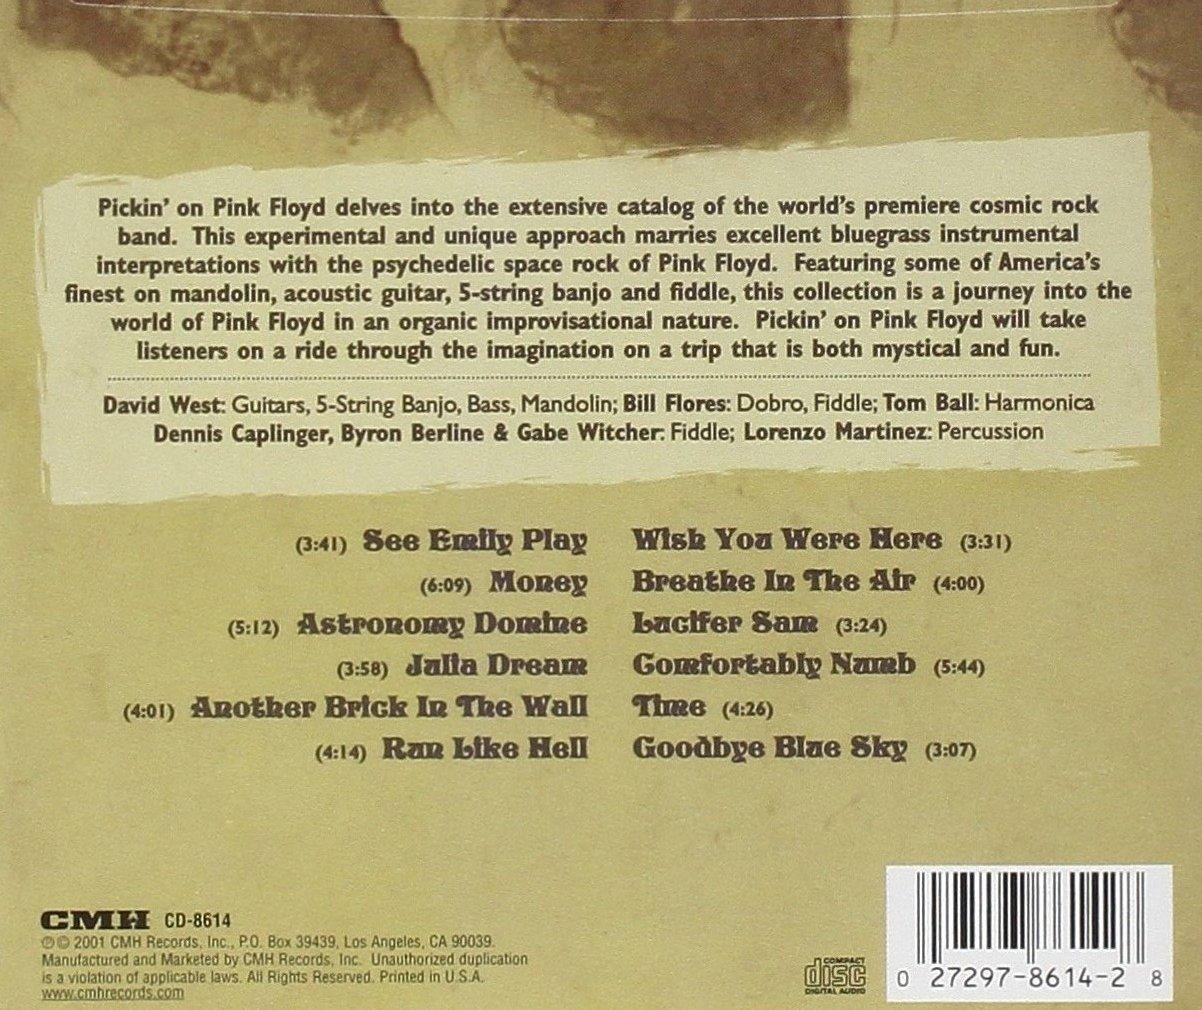 Pickin' On Pink floyd: A Bluegrass Tribute